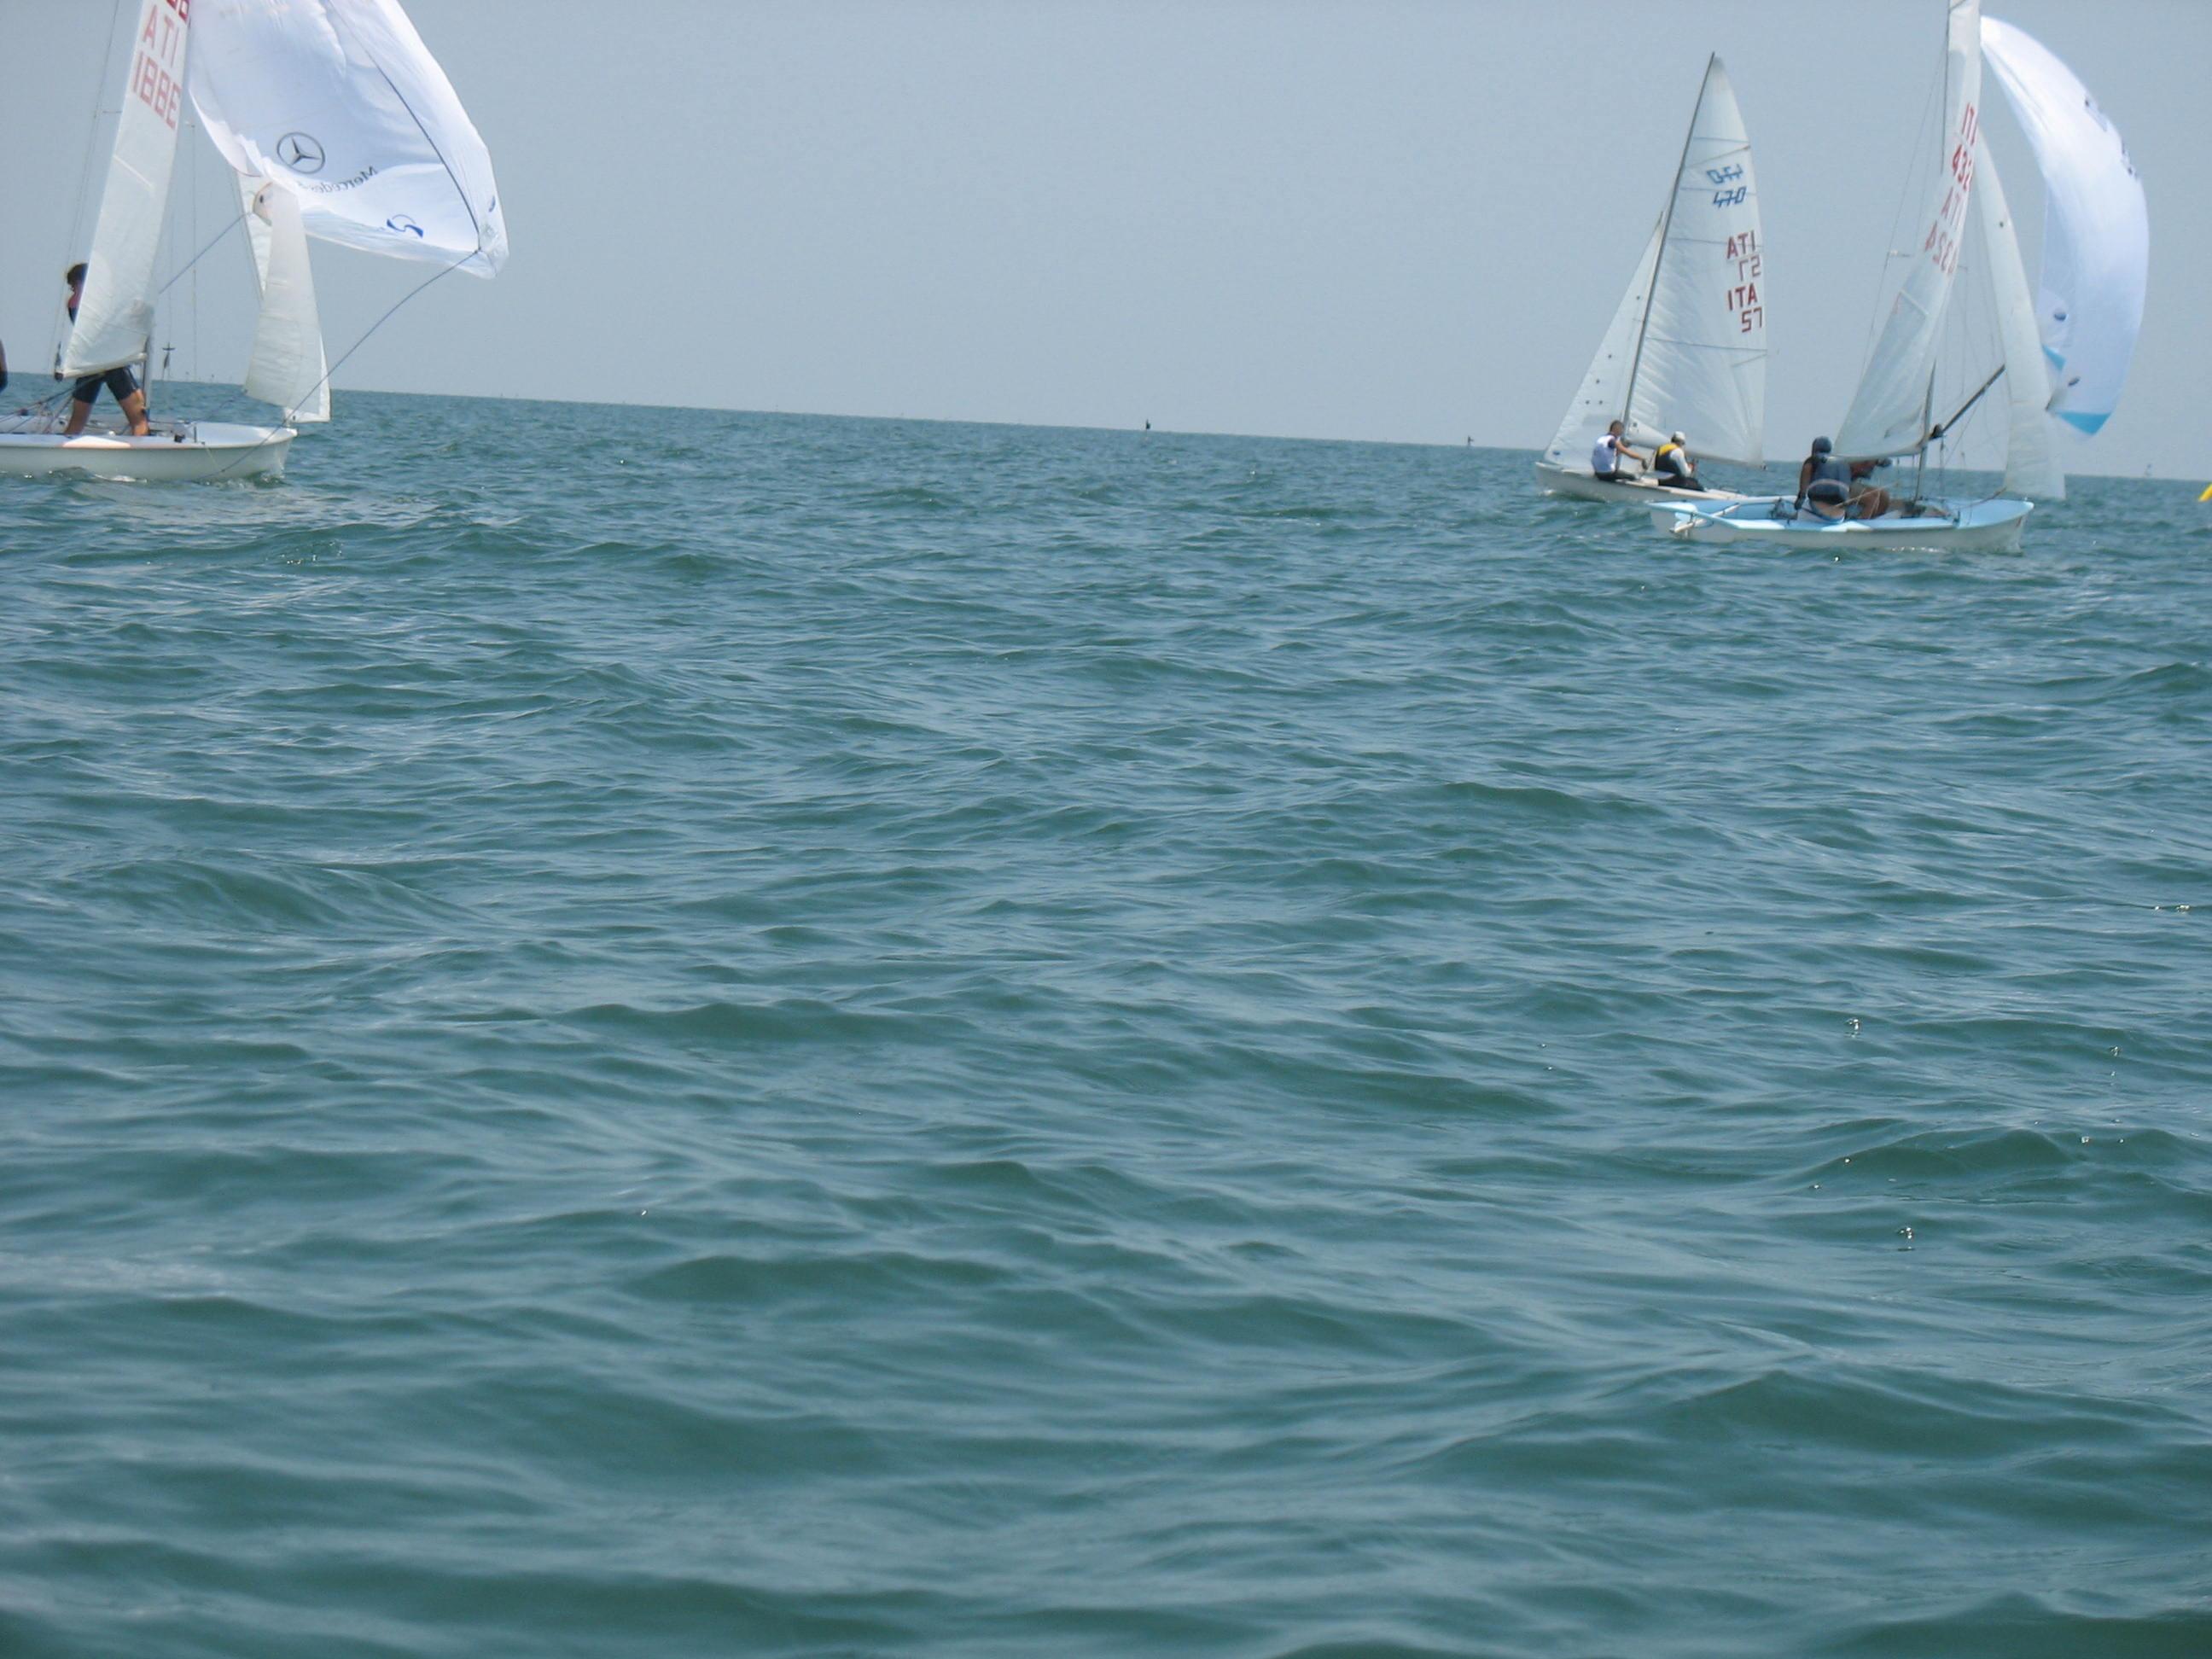 5-torneo-elia-tonelli-27062010-034